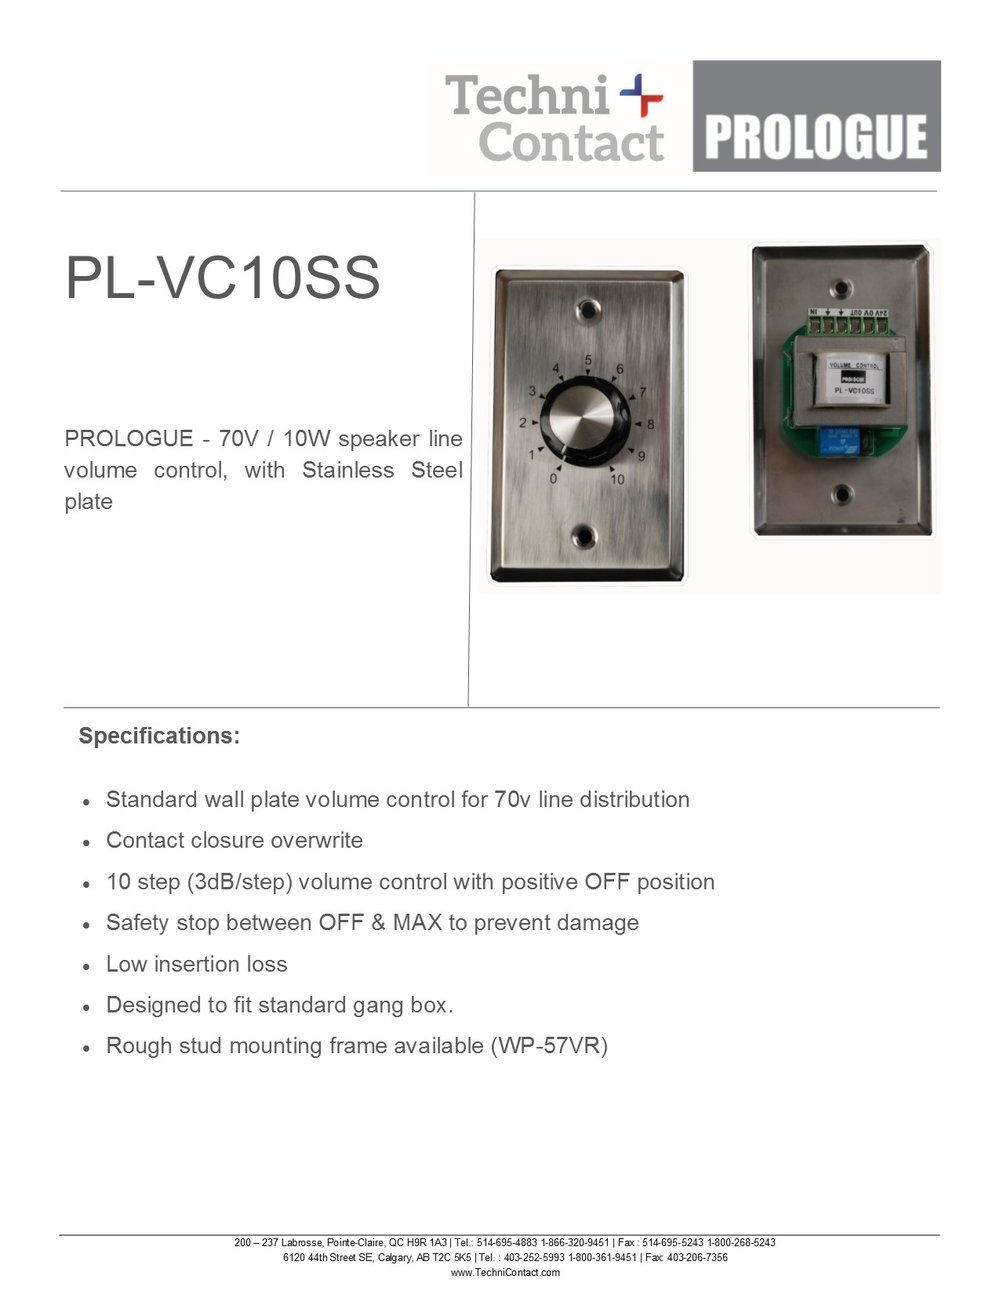 Prologue_PL-VC10SS_SPECS.jpg